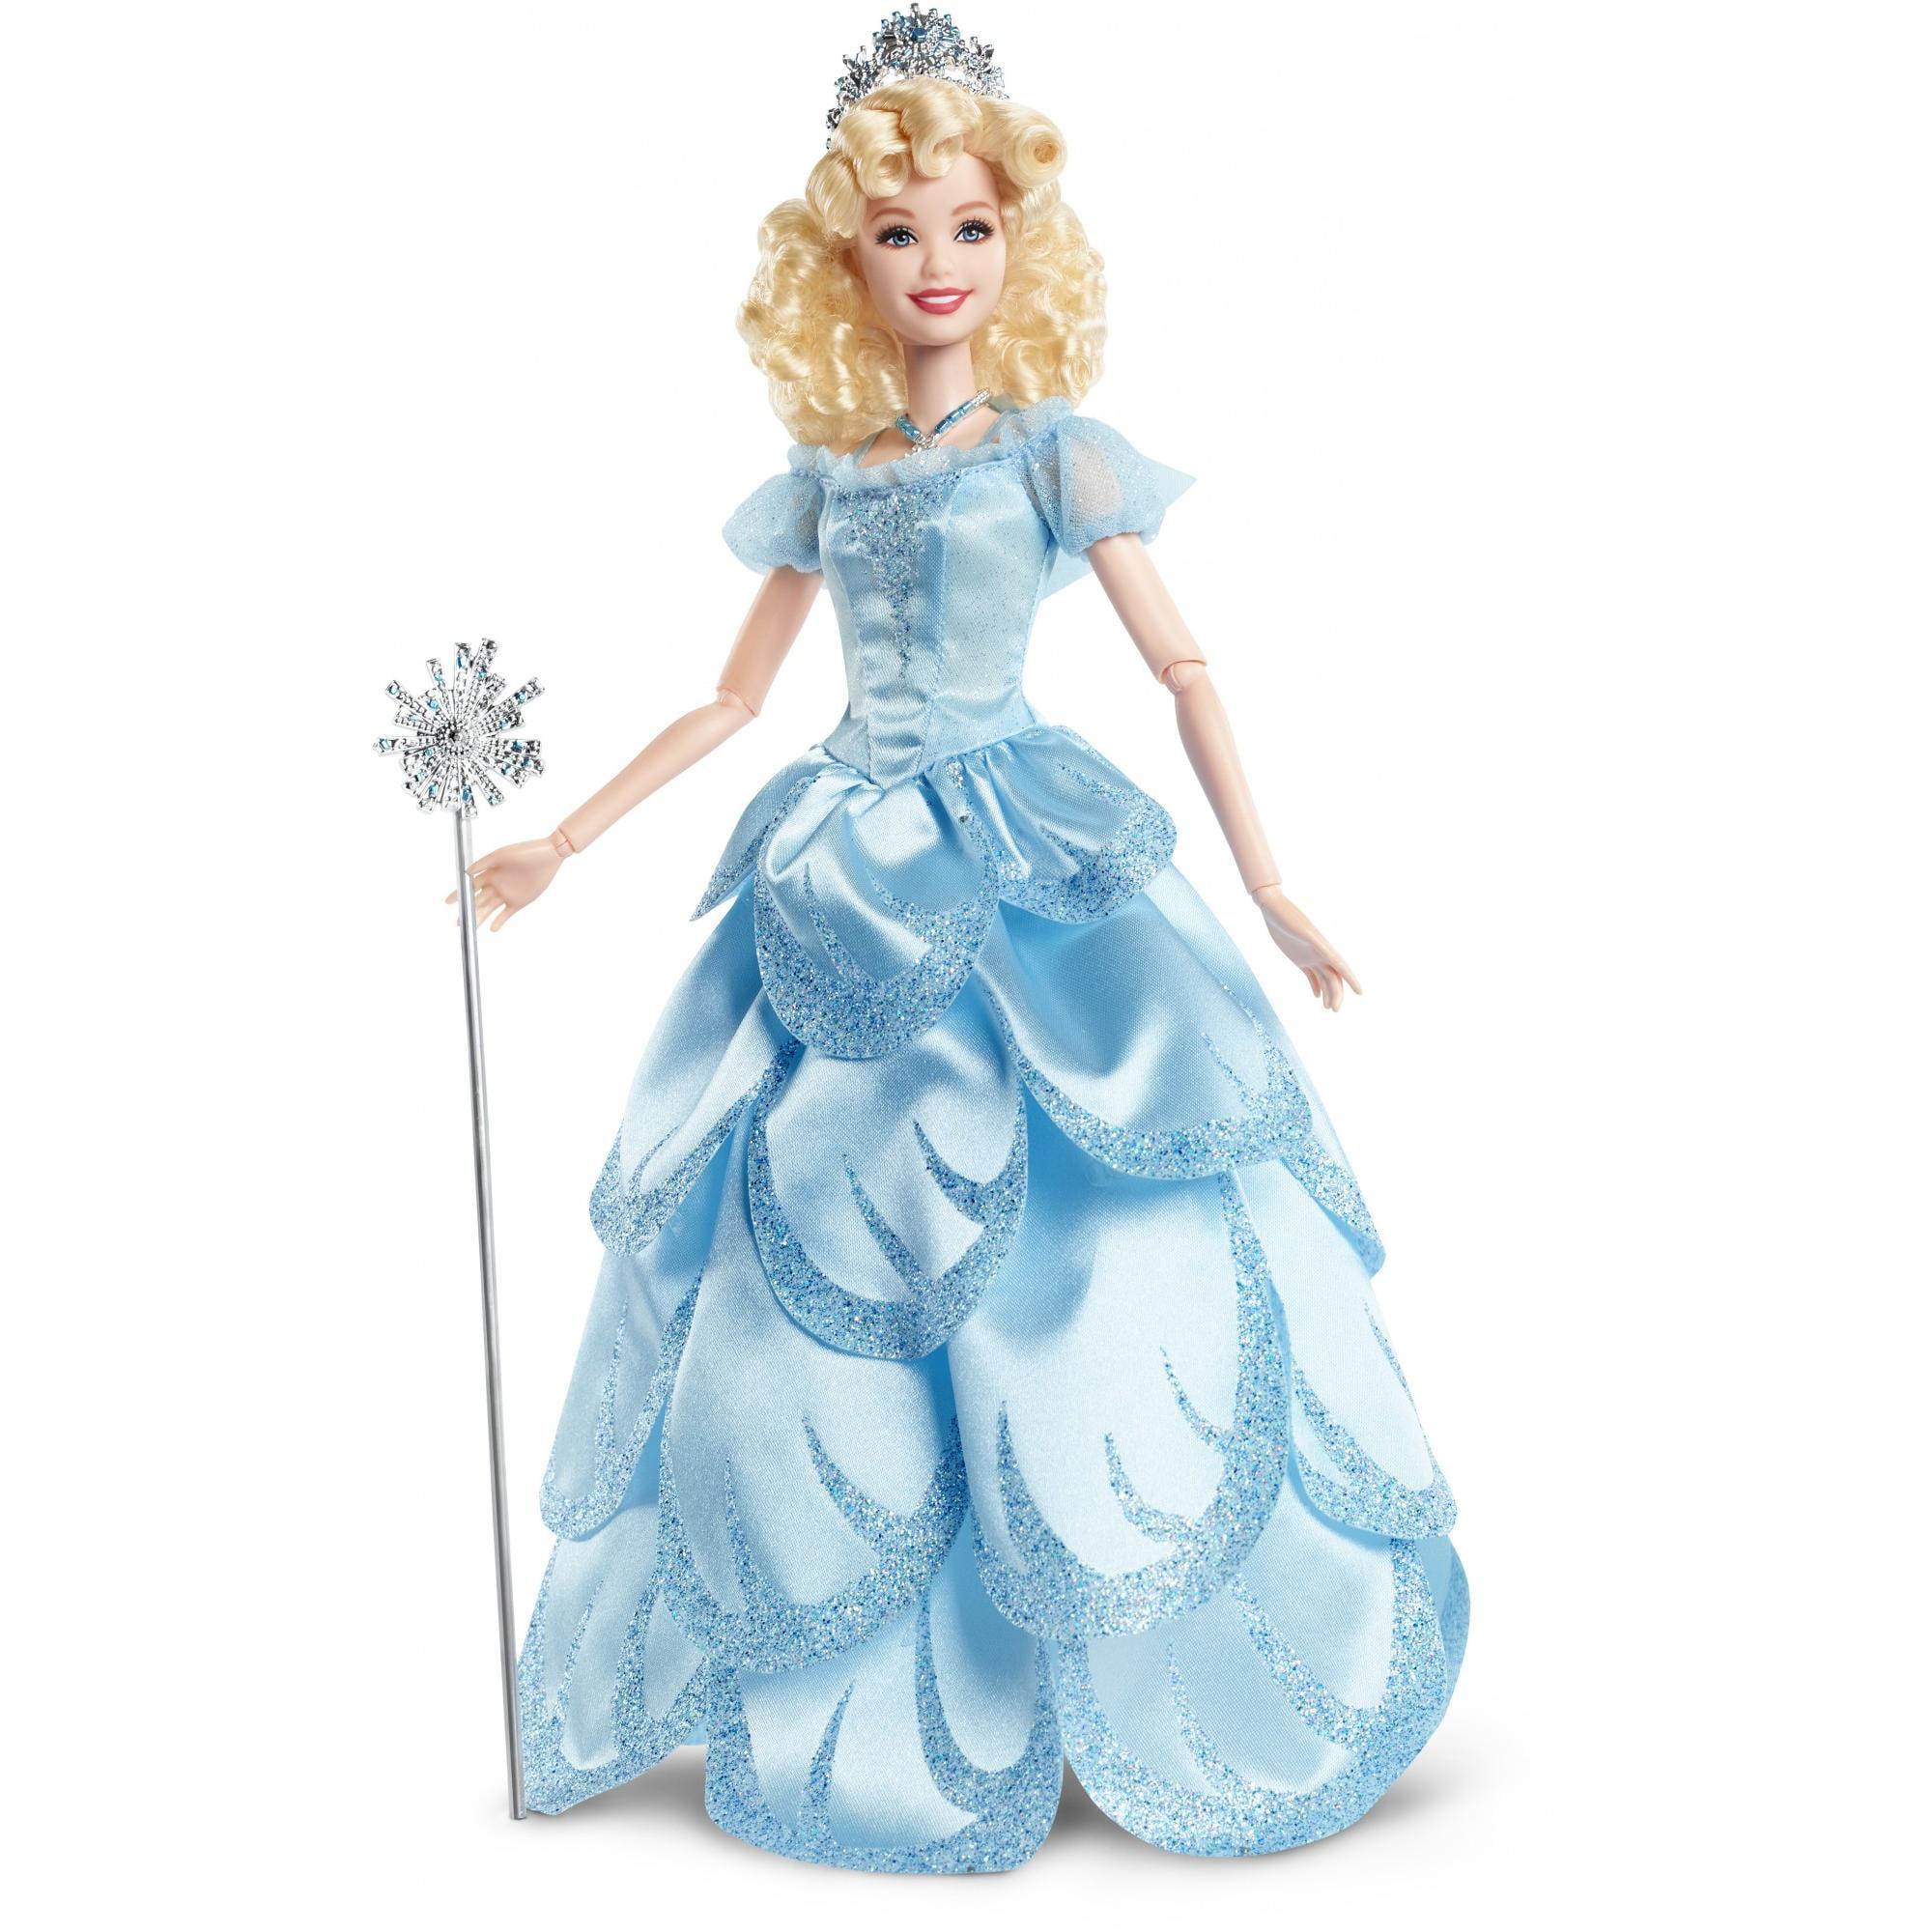 Barbie Wicked Glinda Doll by Mattel